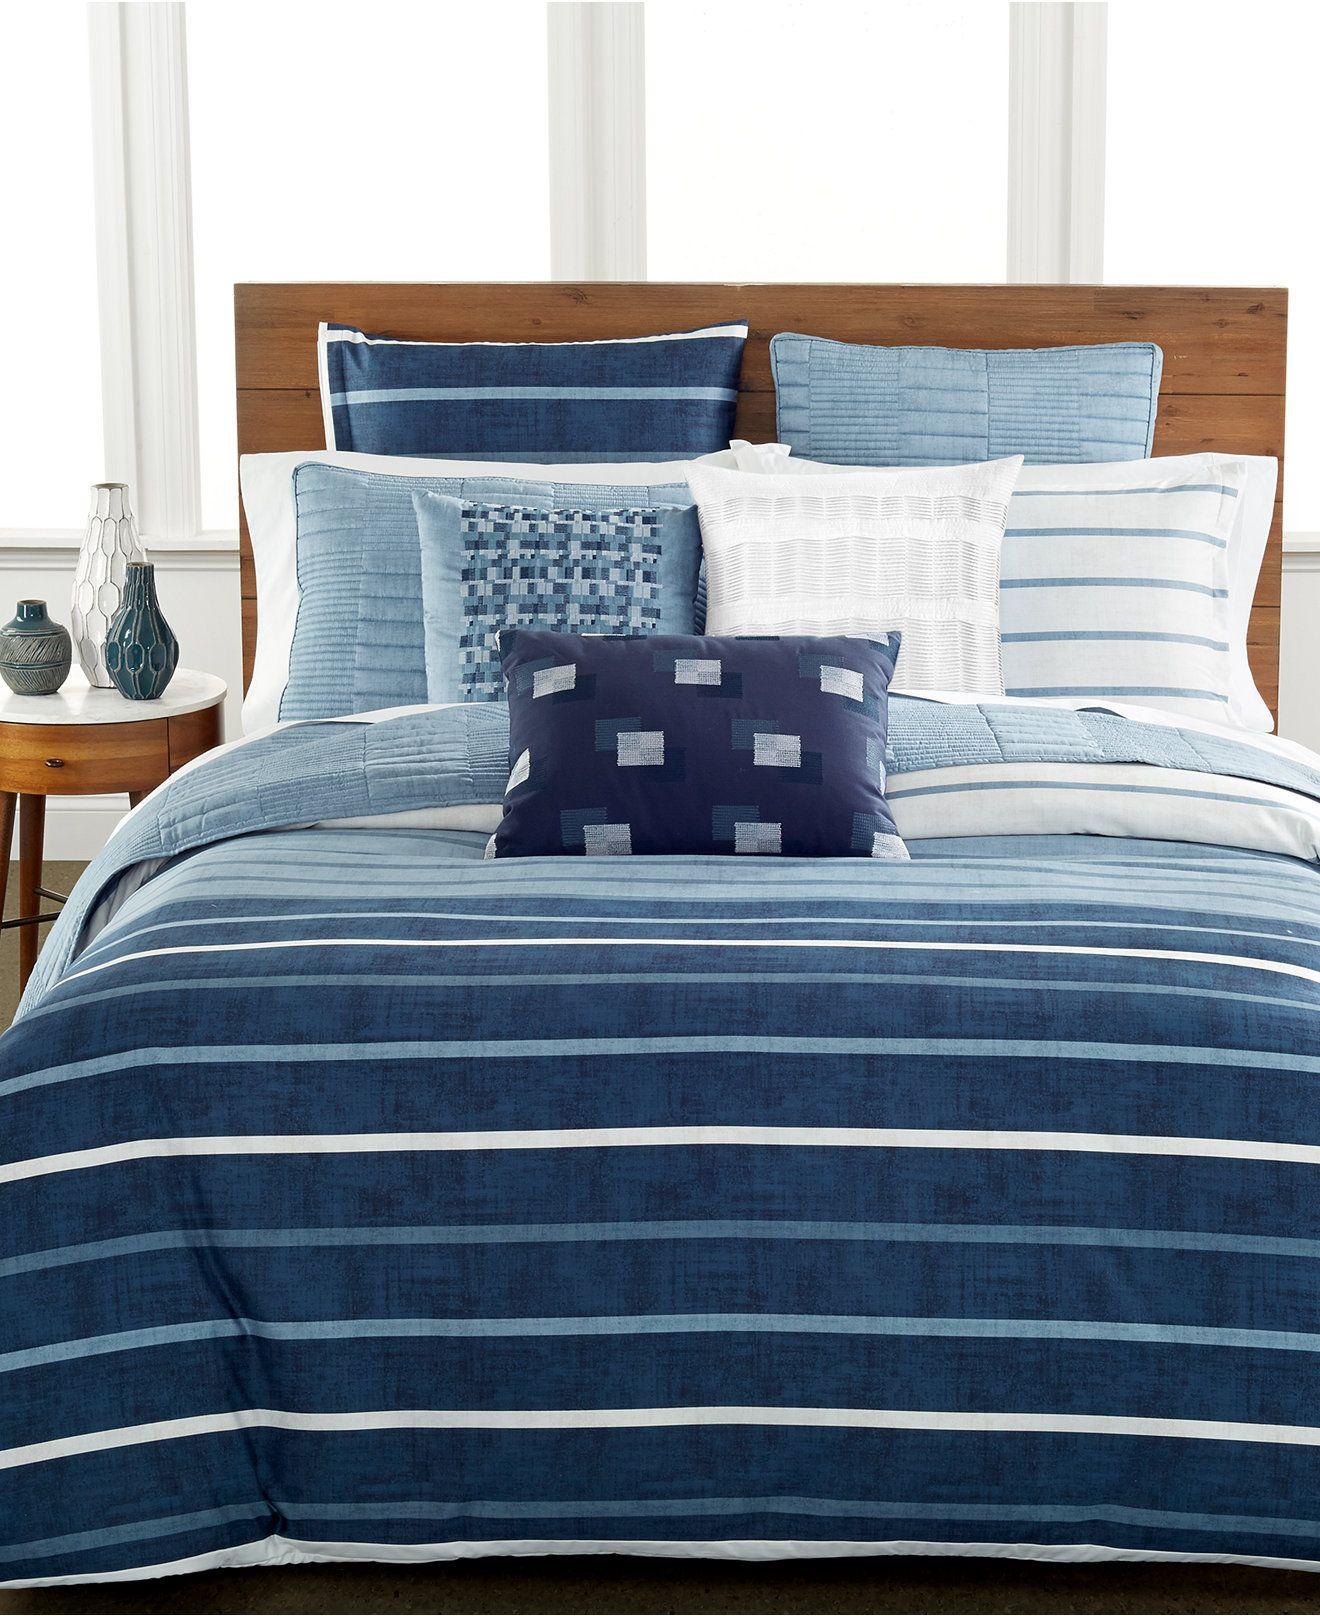 Hotel Collection Colonnade Blue Bedding Collection, Created For Macyu0027s    Bedding Collections   Bed U0026 Bath   Macyu0027s Bridal And Wedding Registry